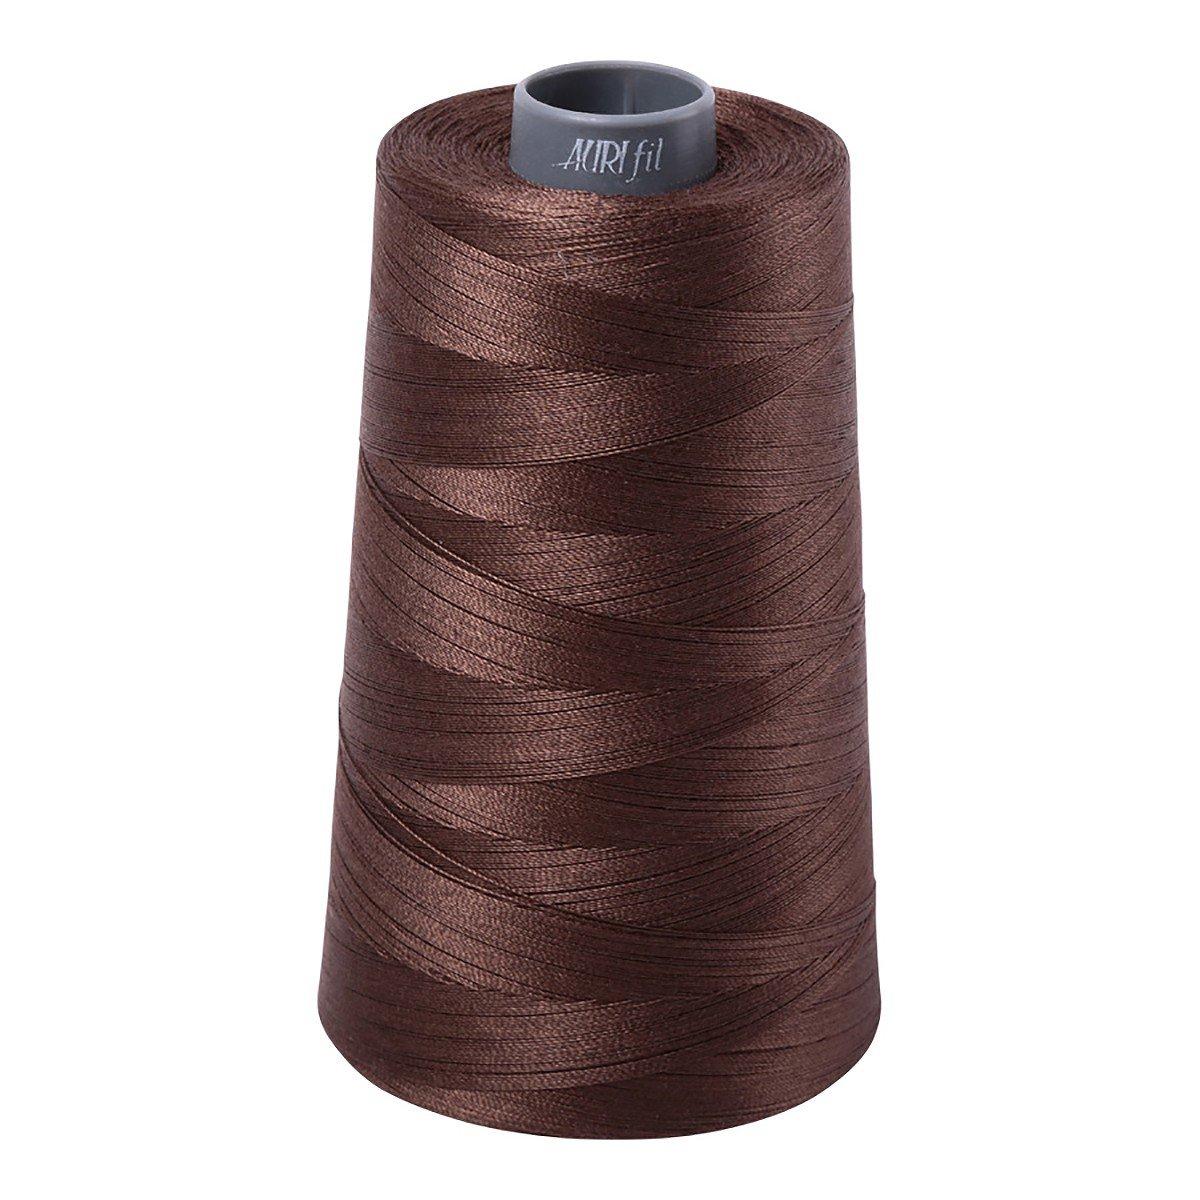 Mako (Cotton) Embroidery Thread 28wt 3609yds Bark